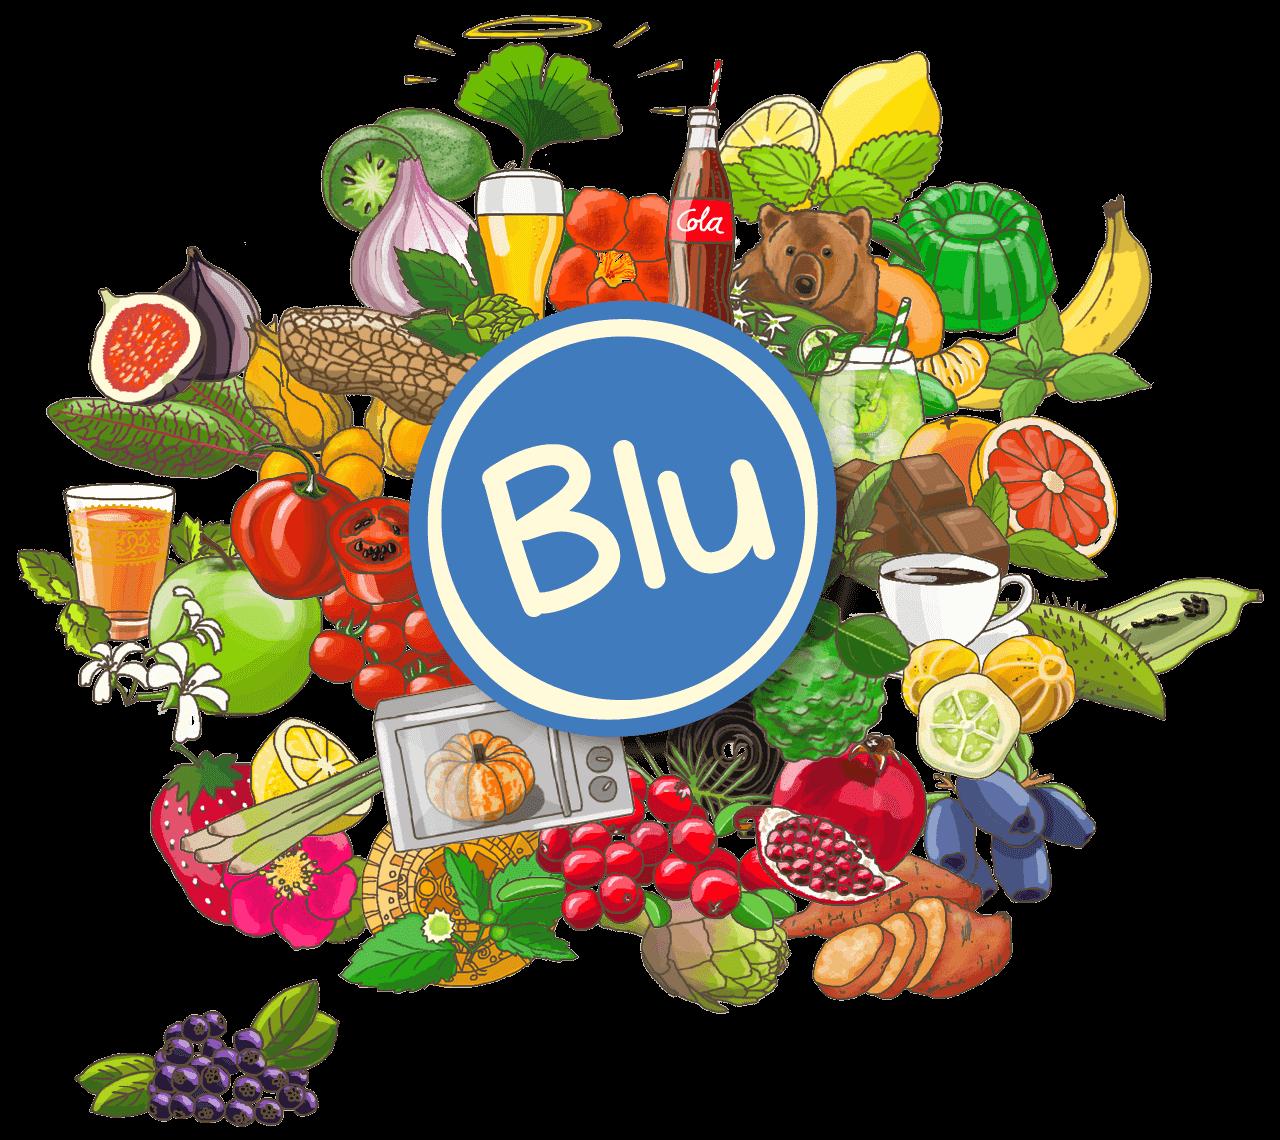 BLu - Bluniversum - Kräuter & Gemüse